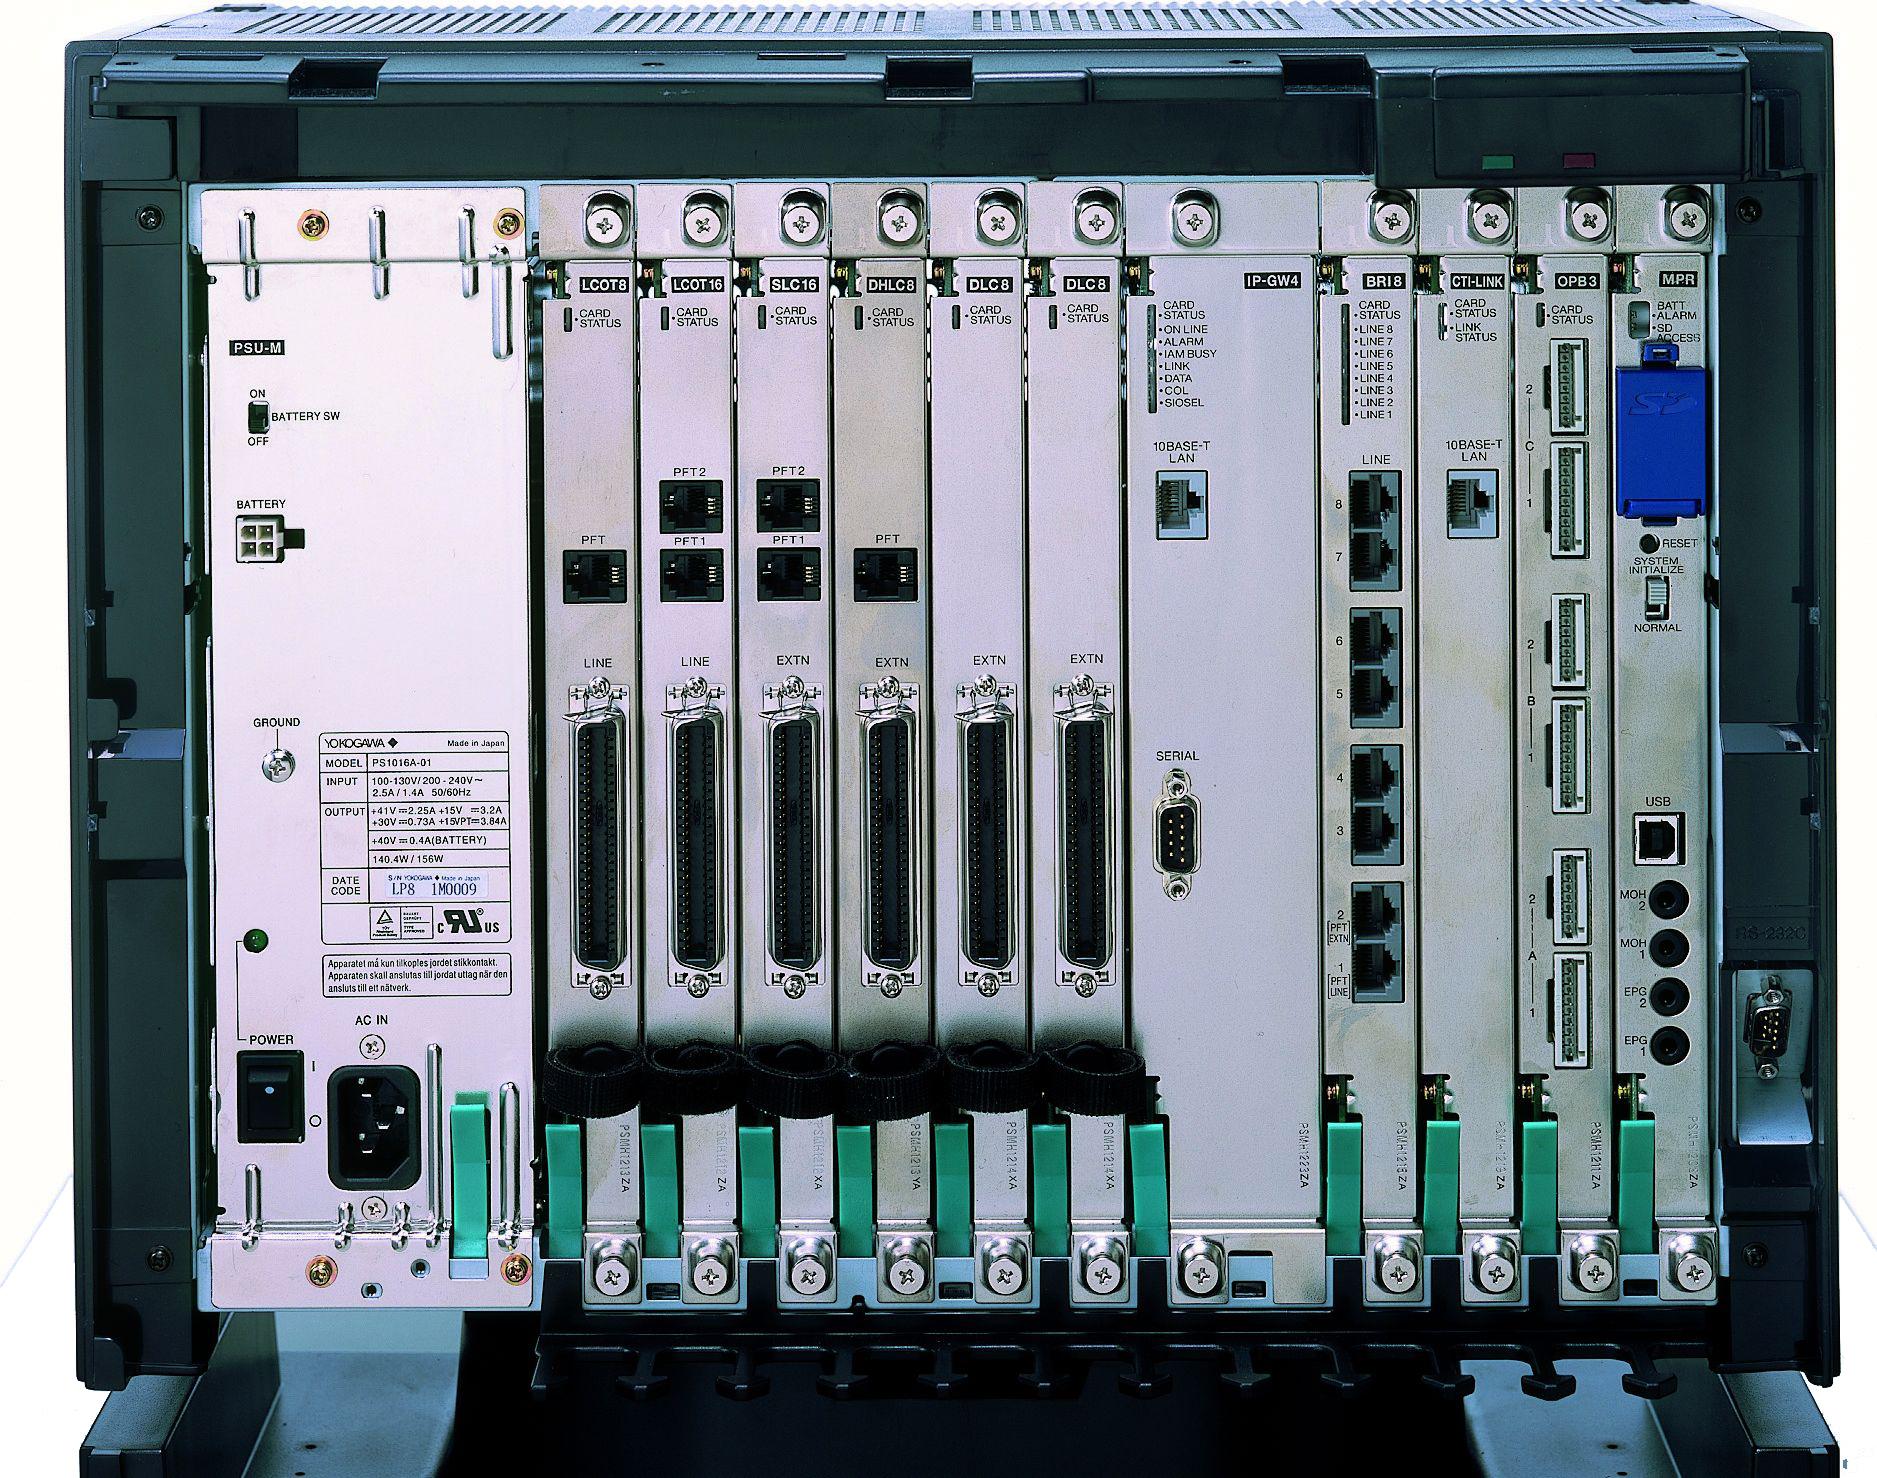 Panasonic Kx tda100 Service Manual list